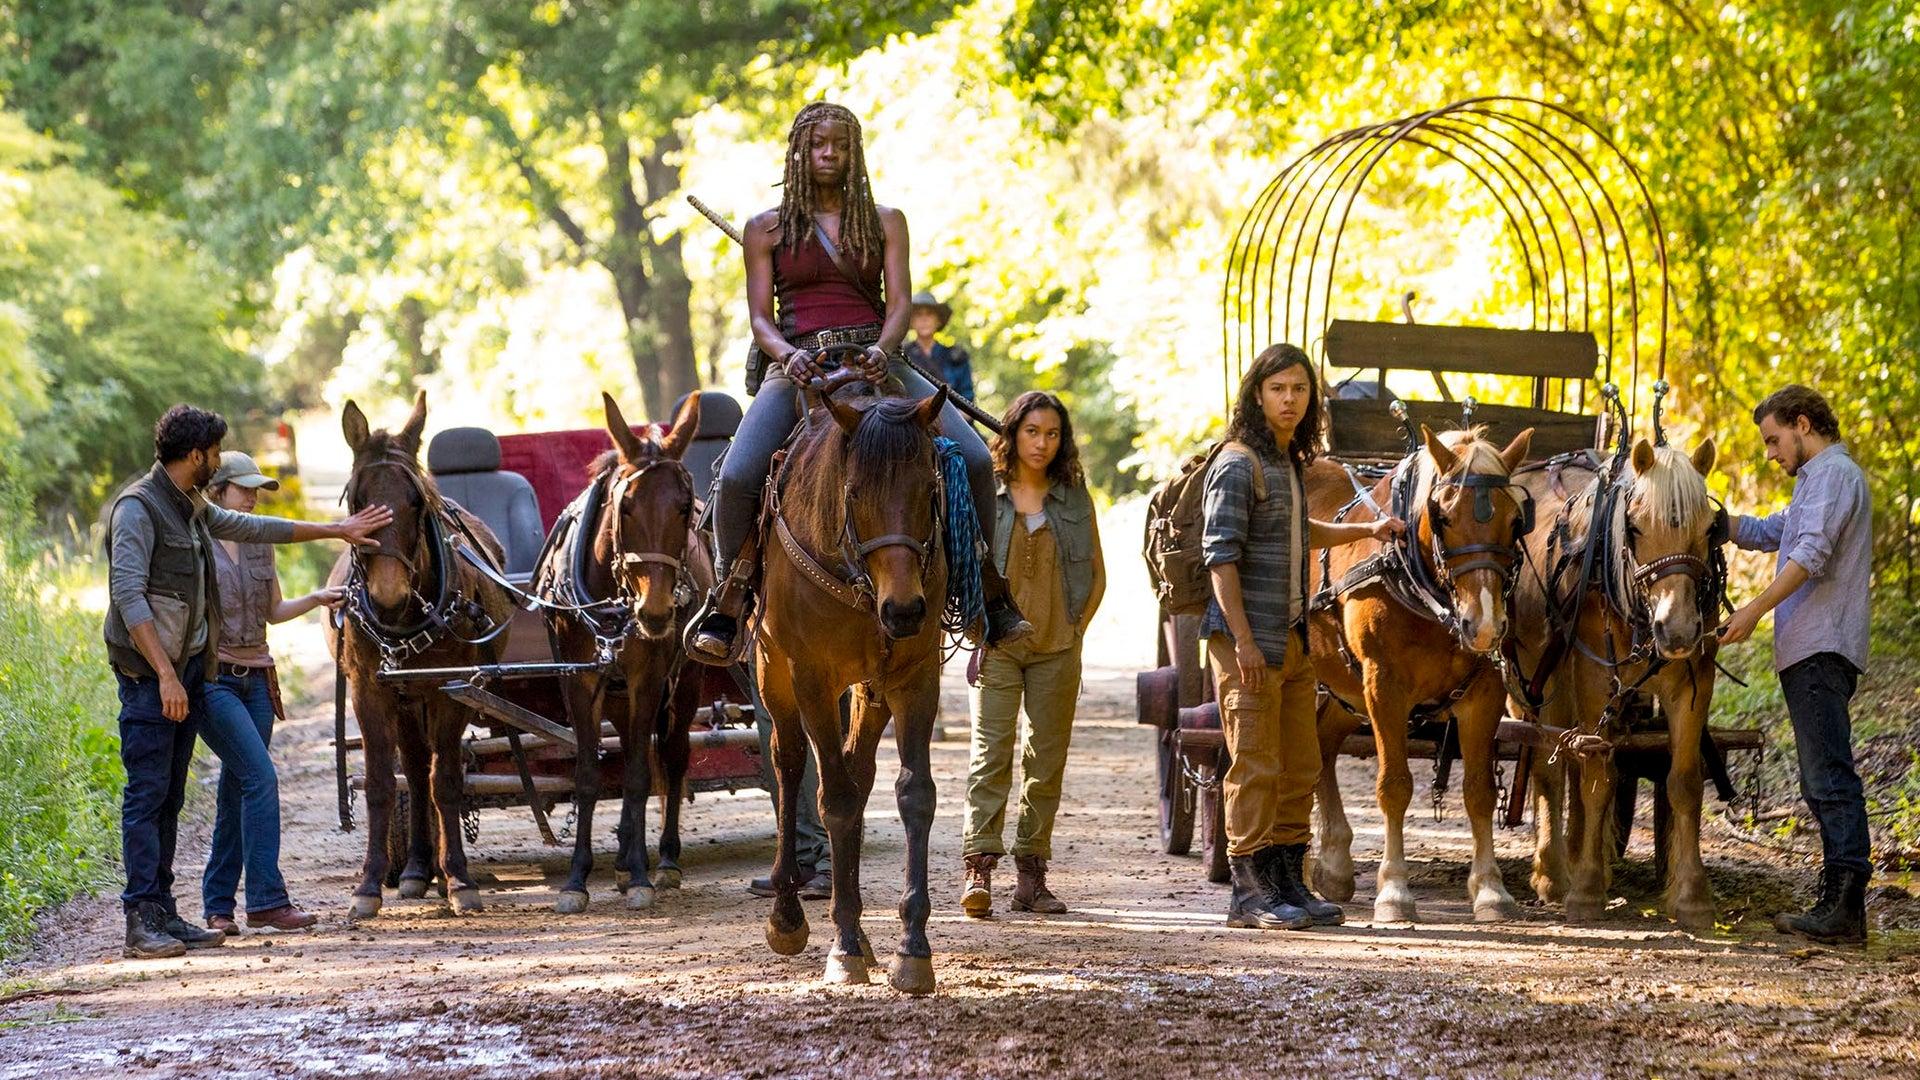 Danai Gurira, Sydney Park and Callan McAuliffe, The Walking Dead